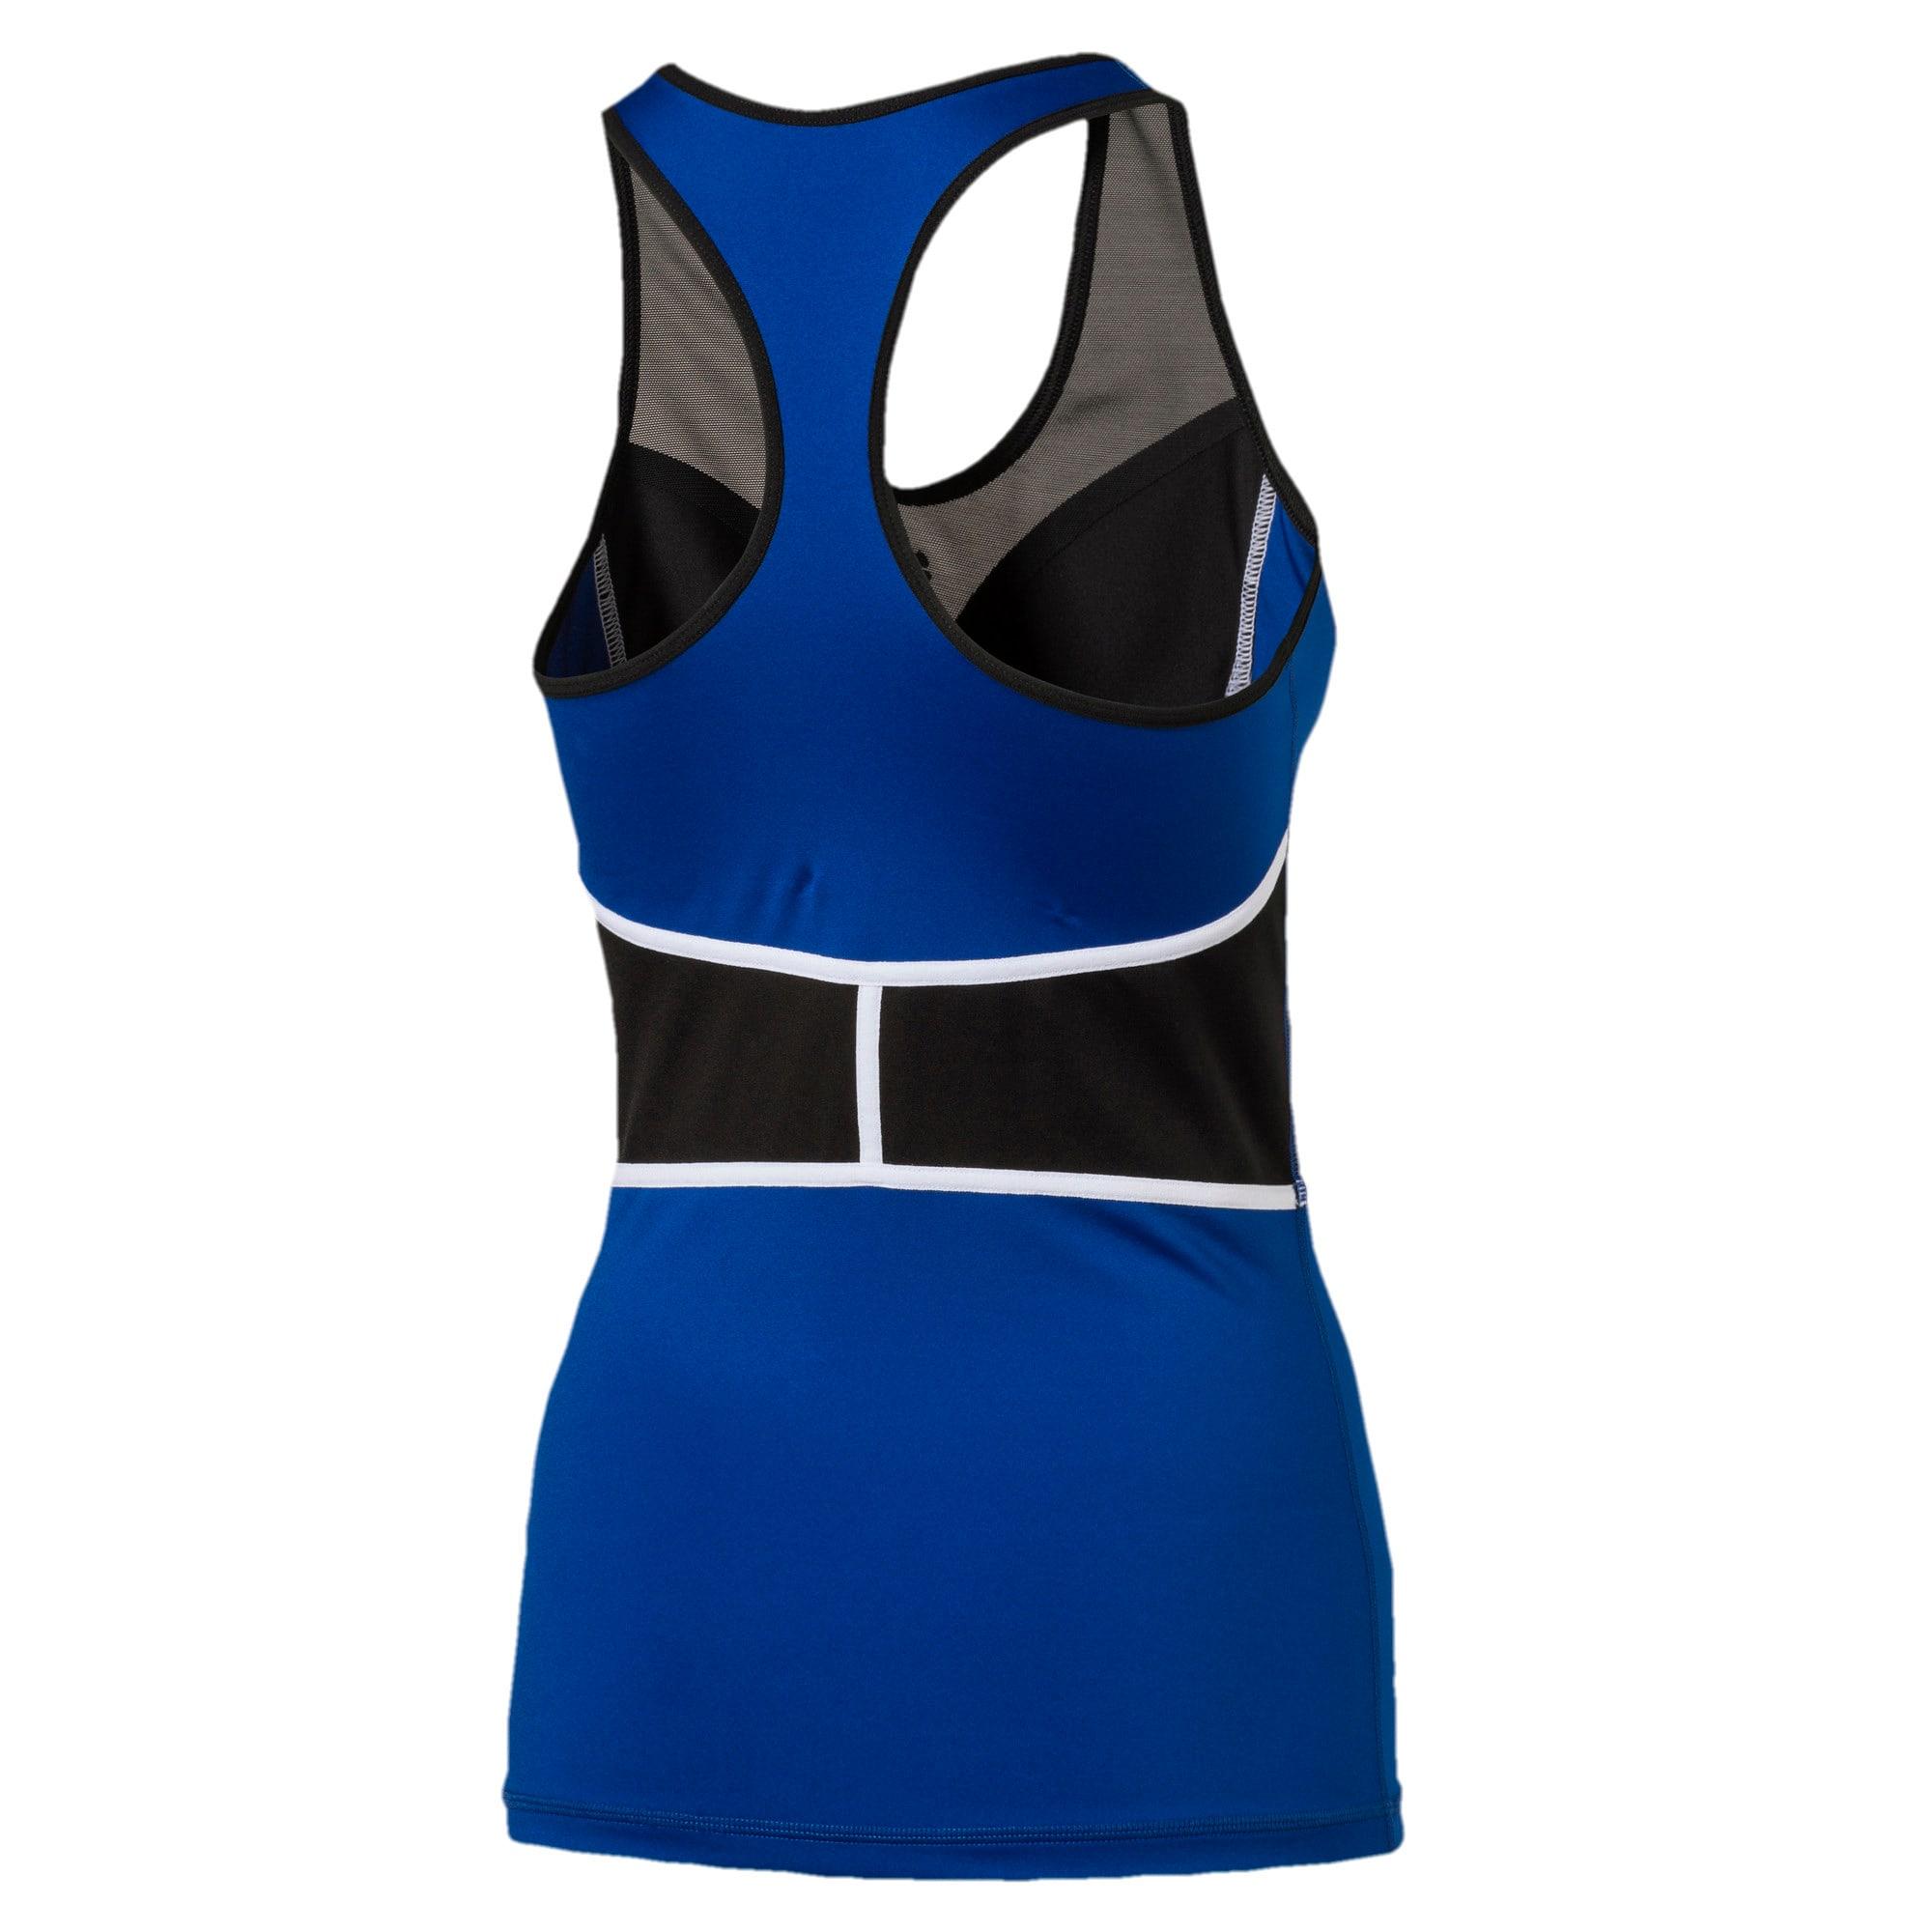 Thumbnail 5 of Active Training Women's PWRSHAPE Tank Top, TRUE BLUE-Puma Black, medium-IND